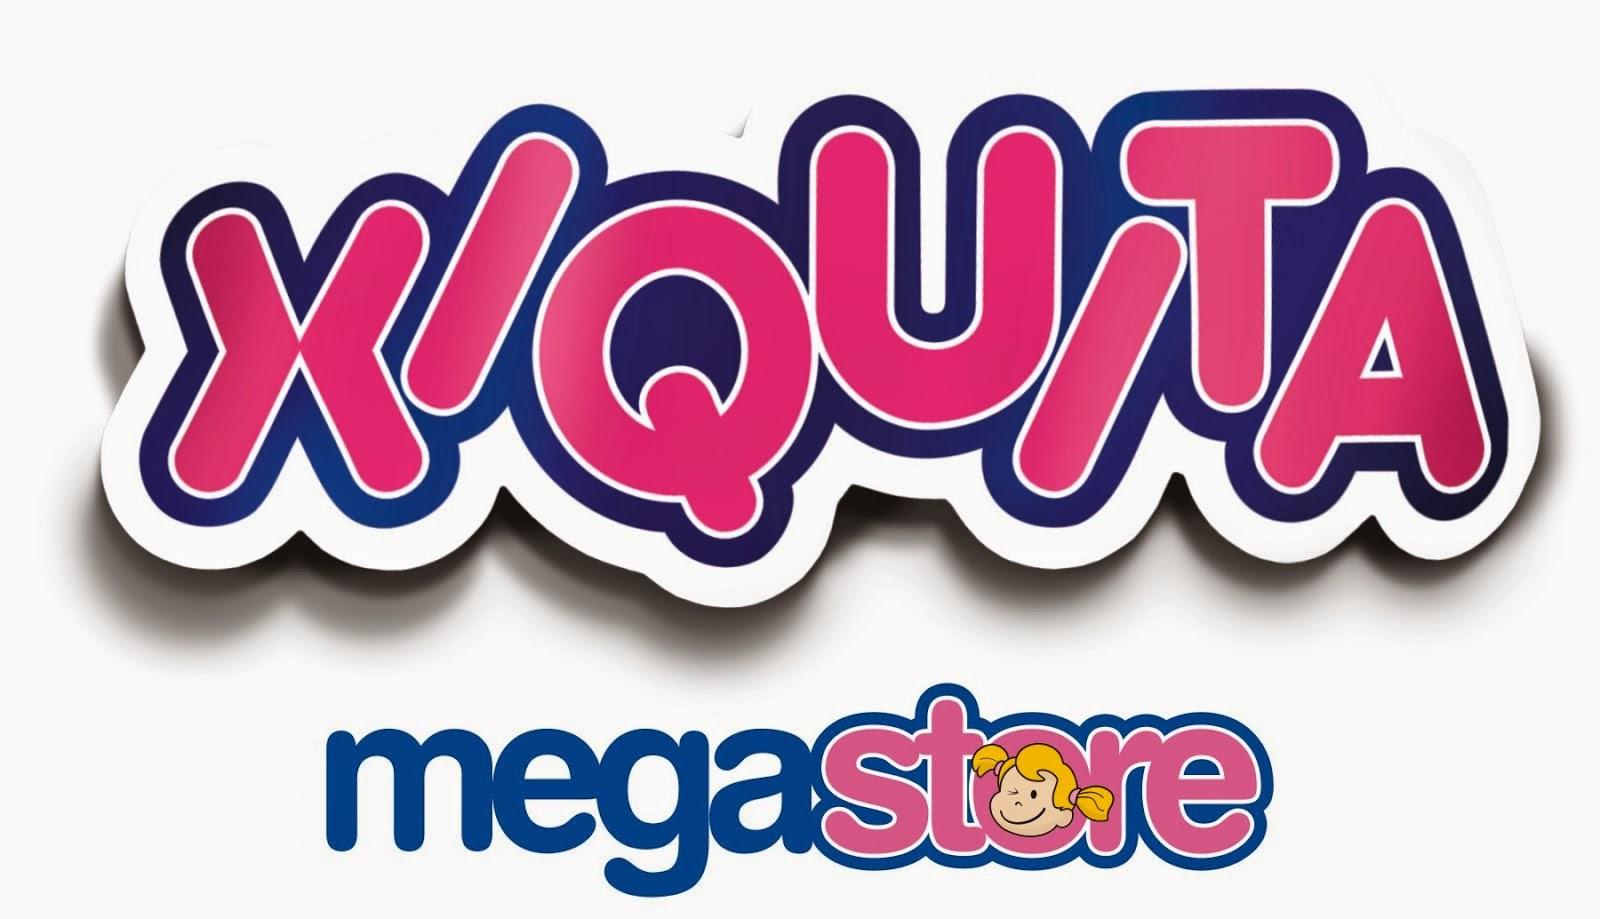 Mega Store Xiquita